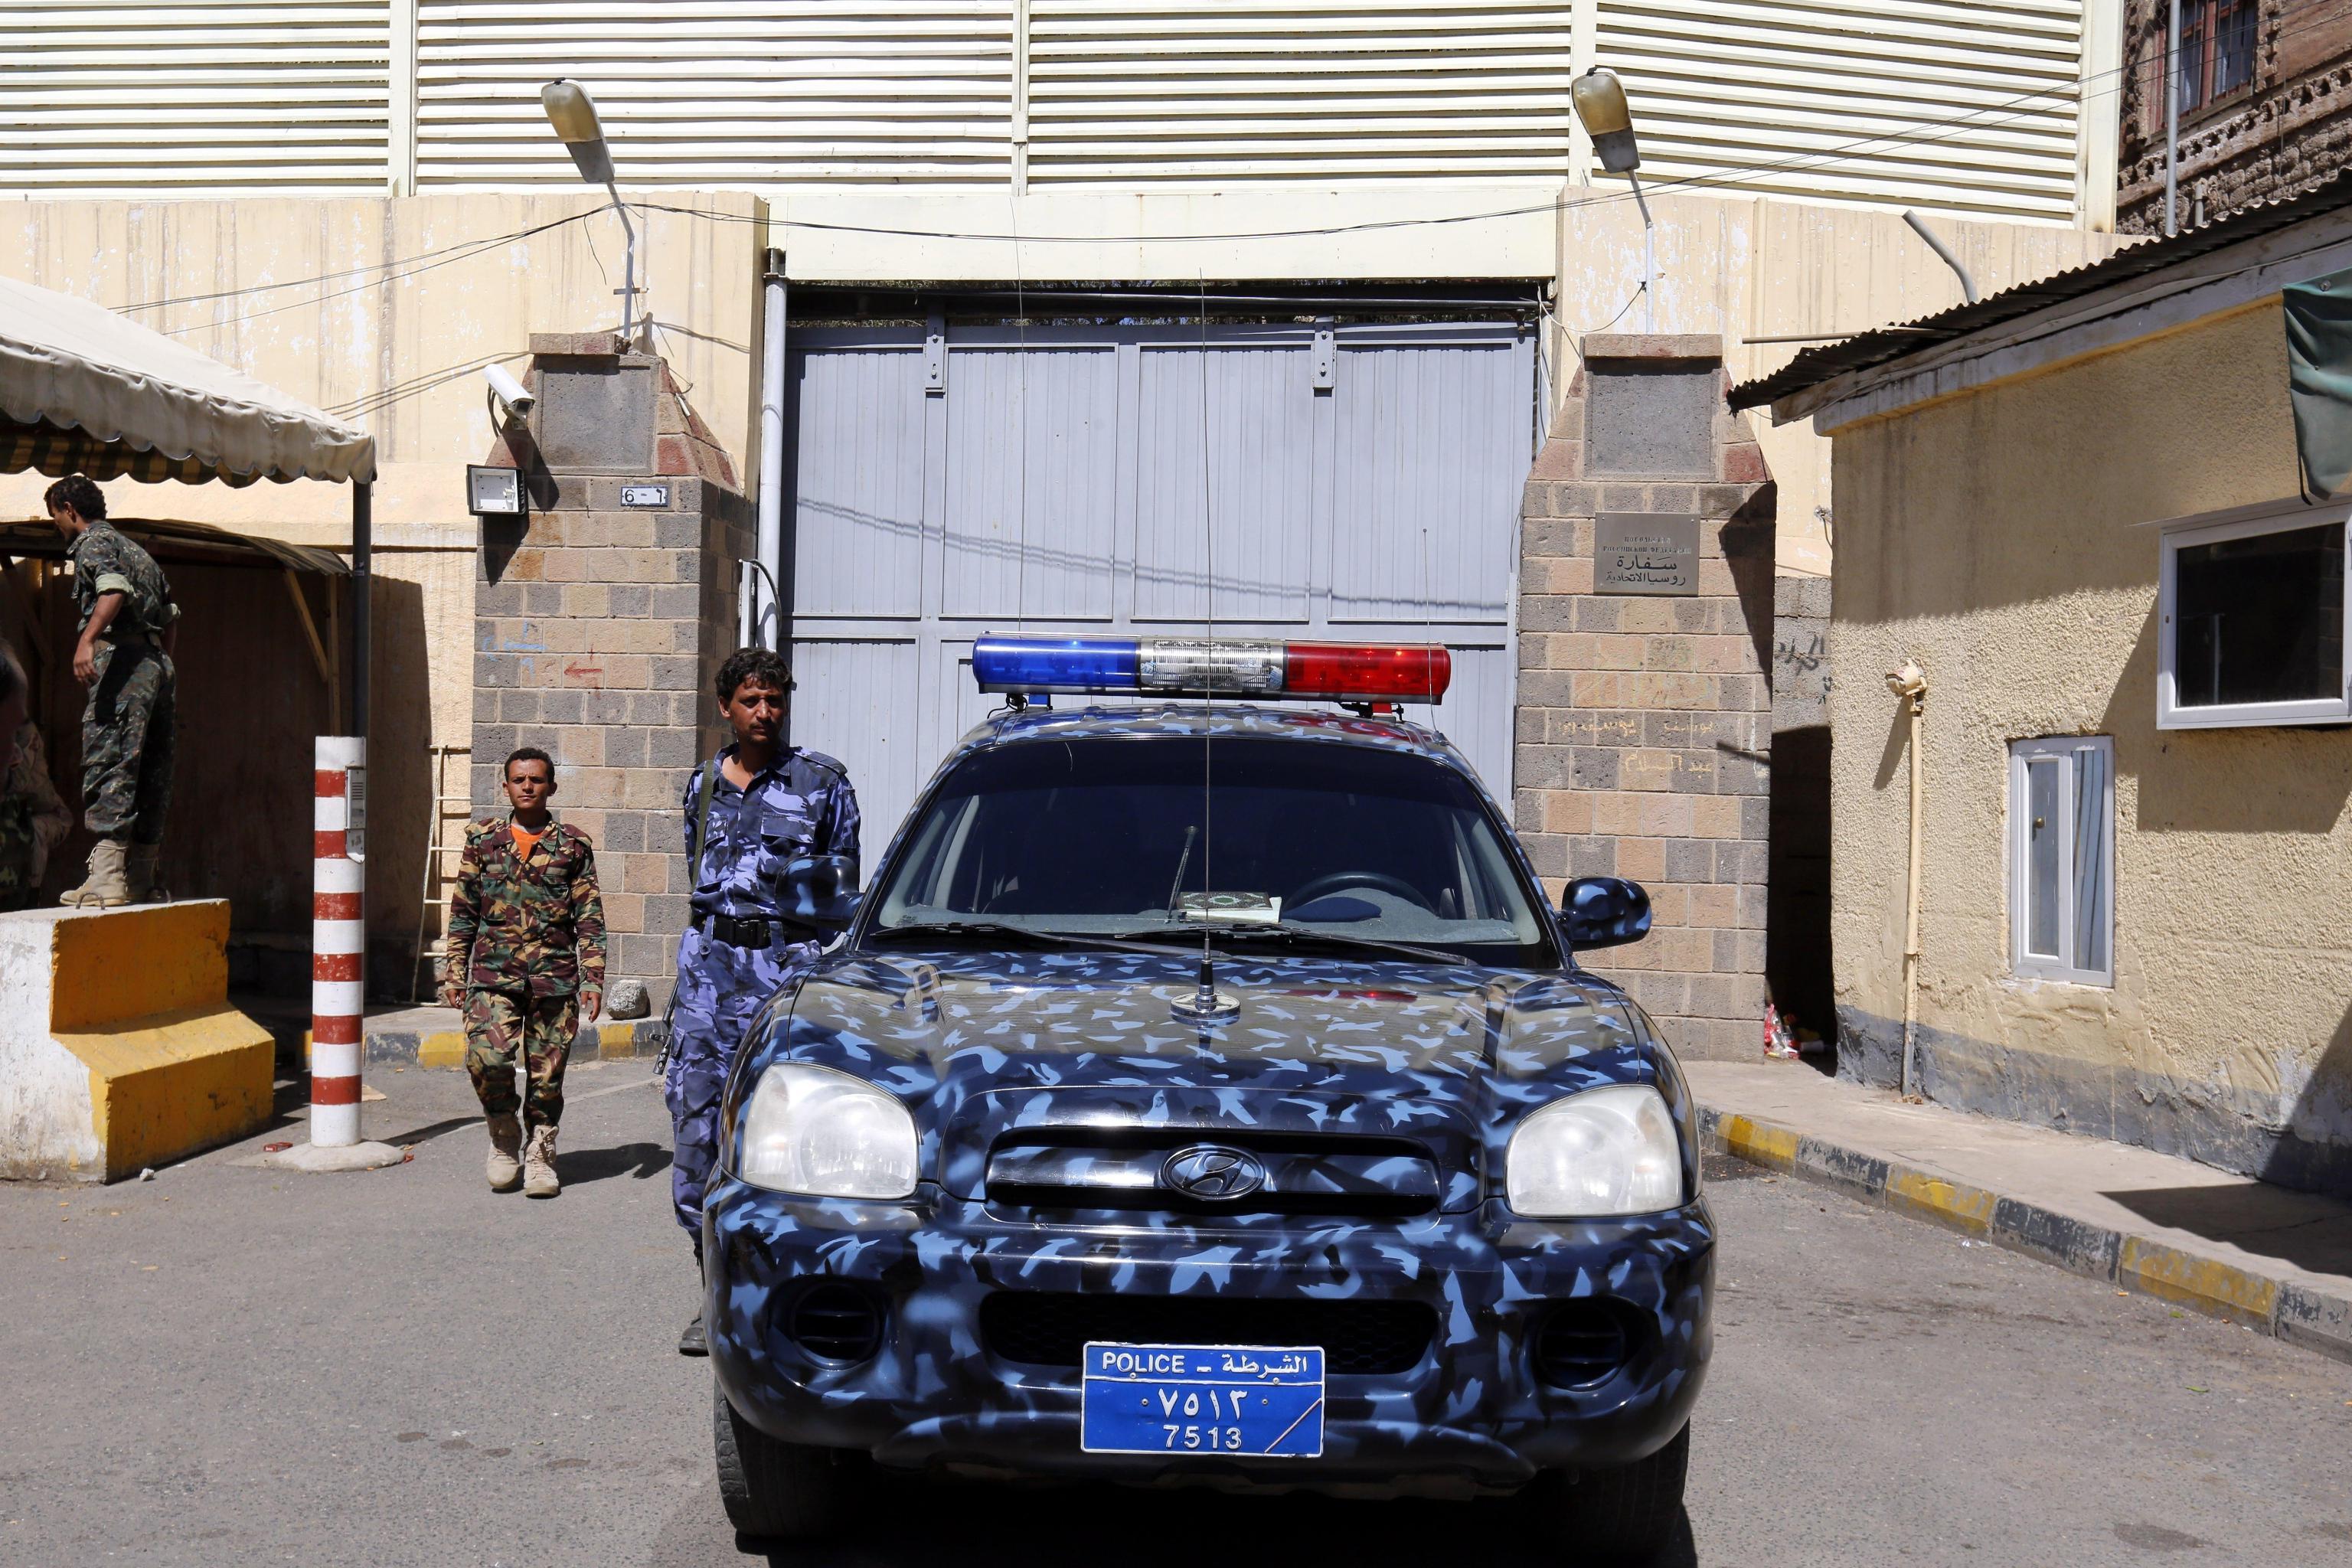 Yemen: Mosca chiude l'ambasciata a Sanaa